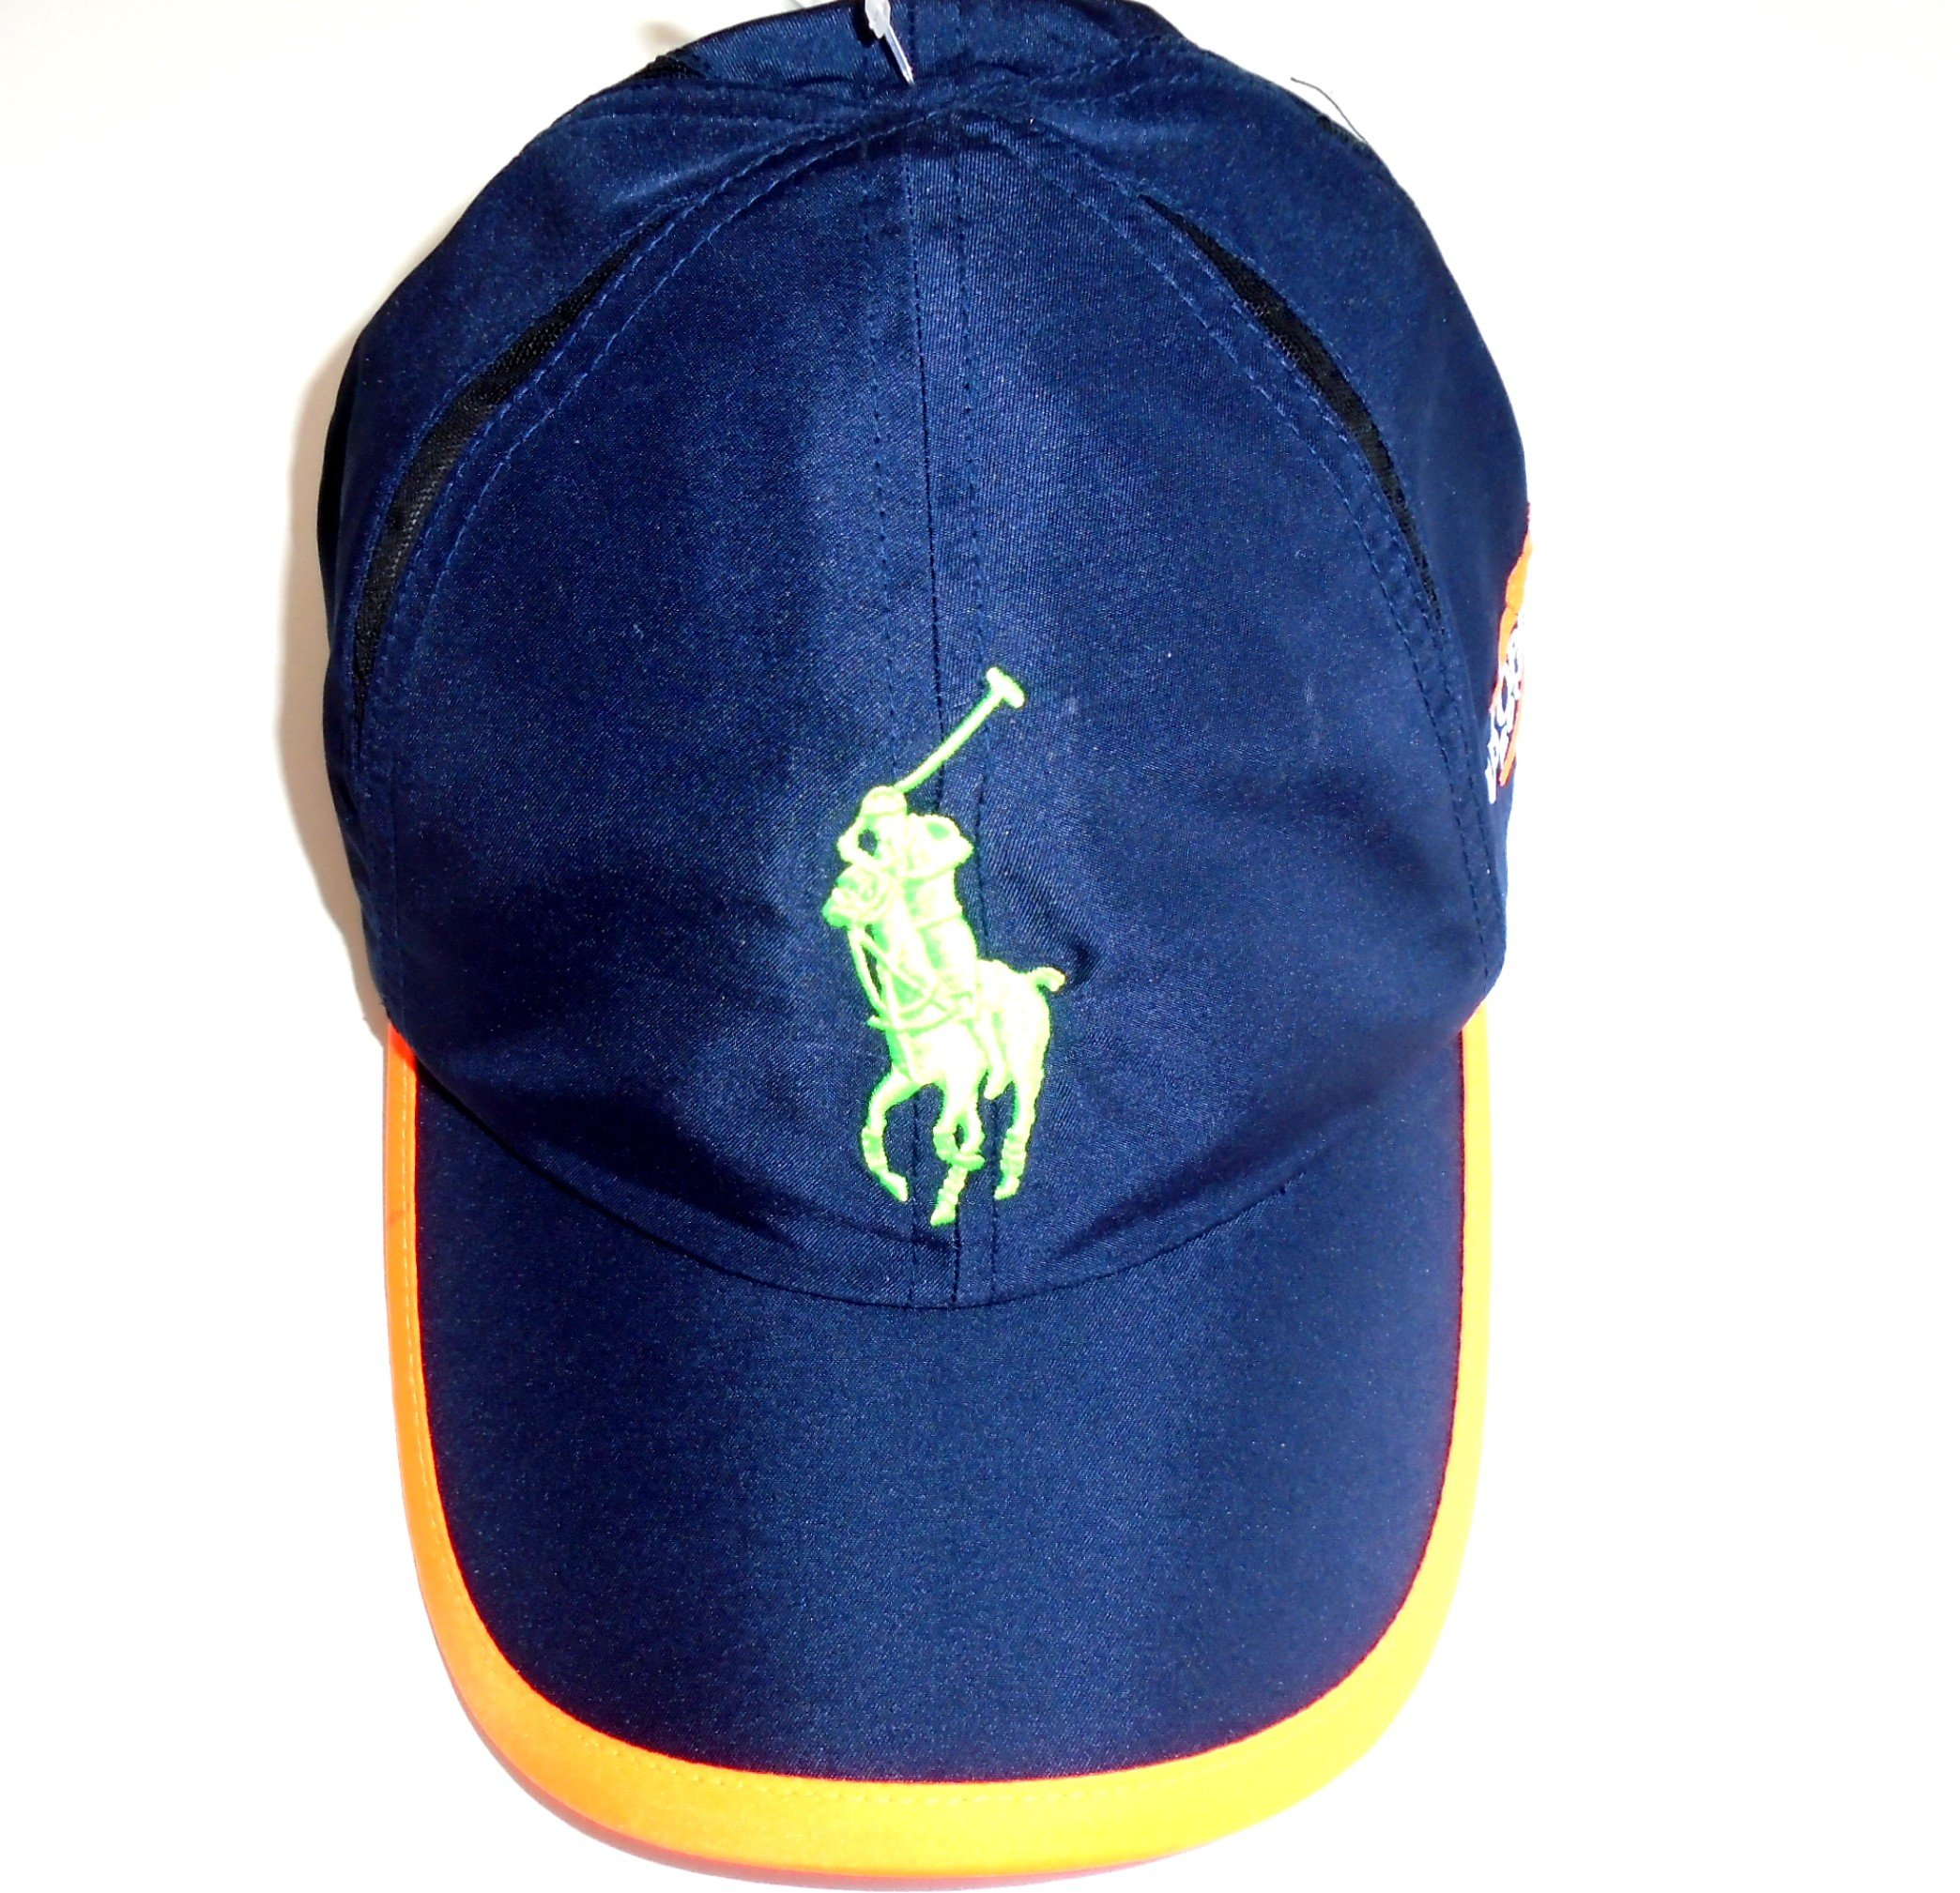 Galleon 2016 Polo Edition Limited Us Ralph Crosscourt Open Lauren srdBtQxhC